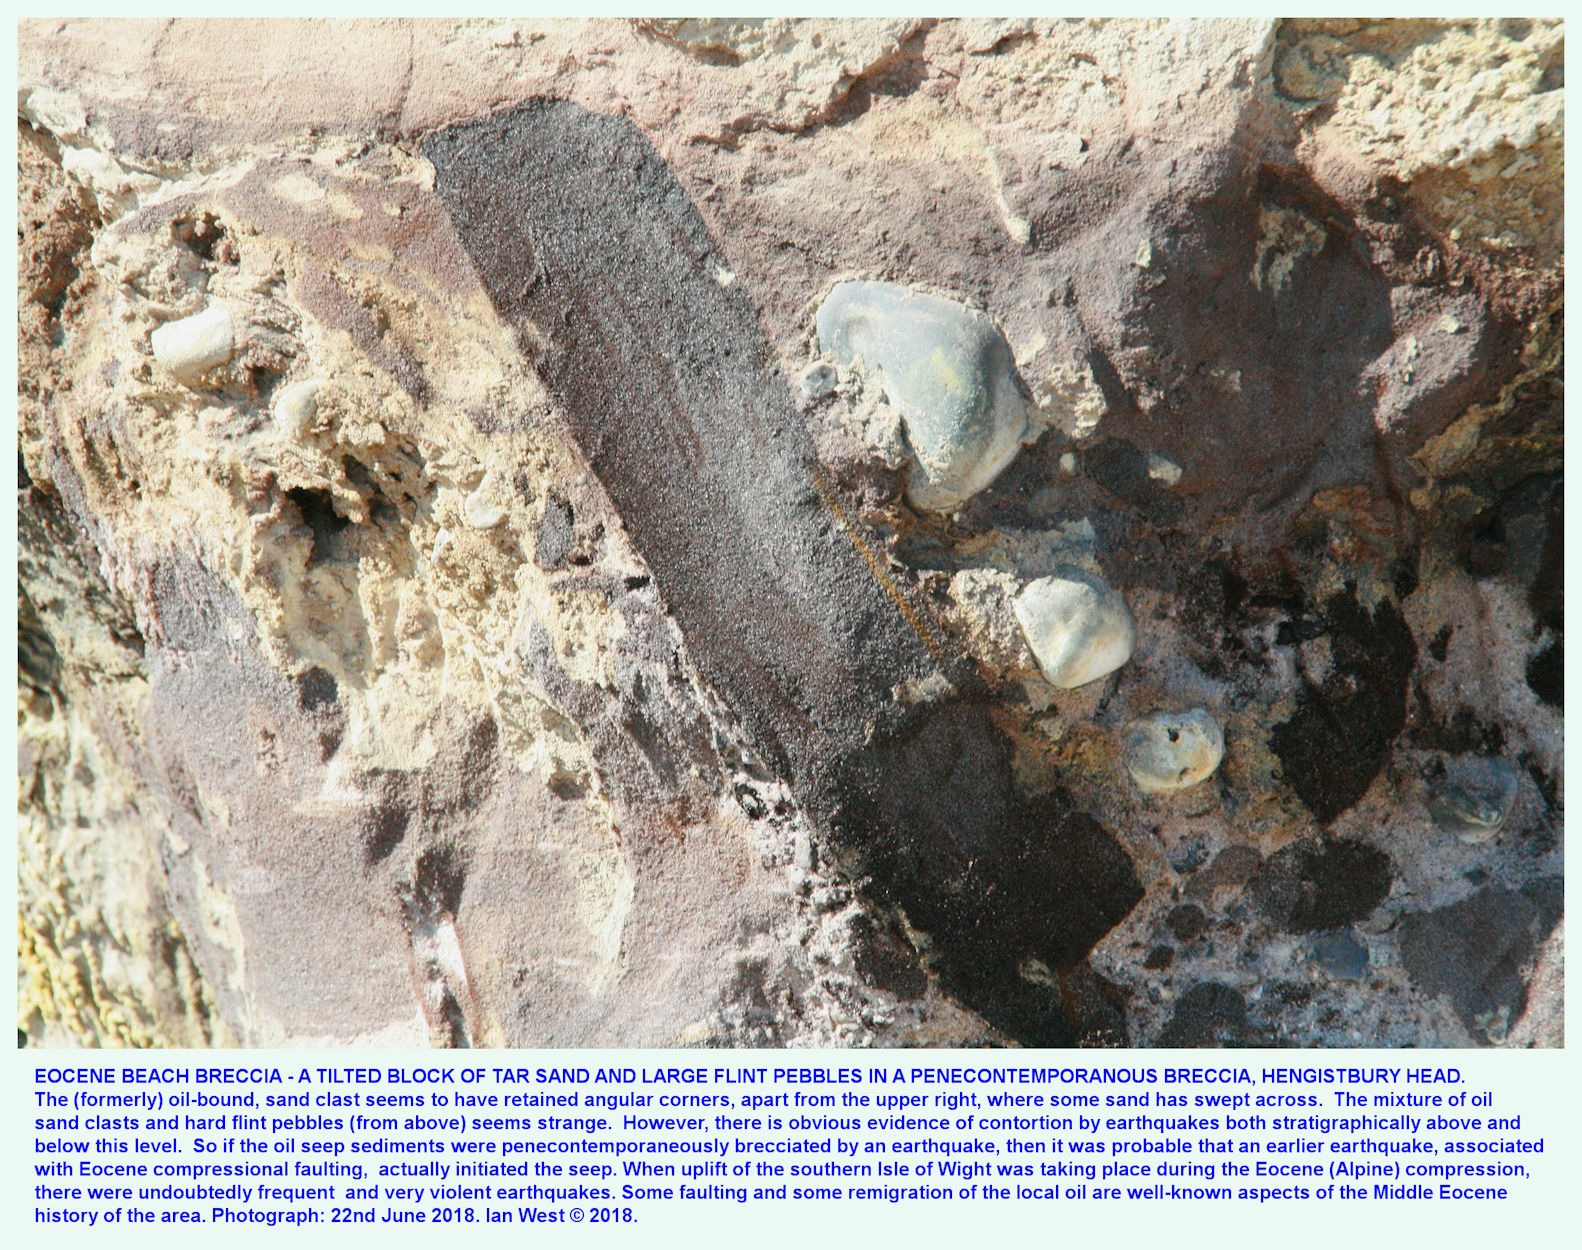 A tilted slab of former tar sand in penecontemporaneously- brecciated strata, effect of an Eocene earthquake, Hengistbury Head, Dorset